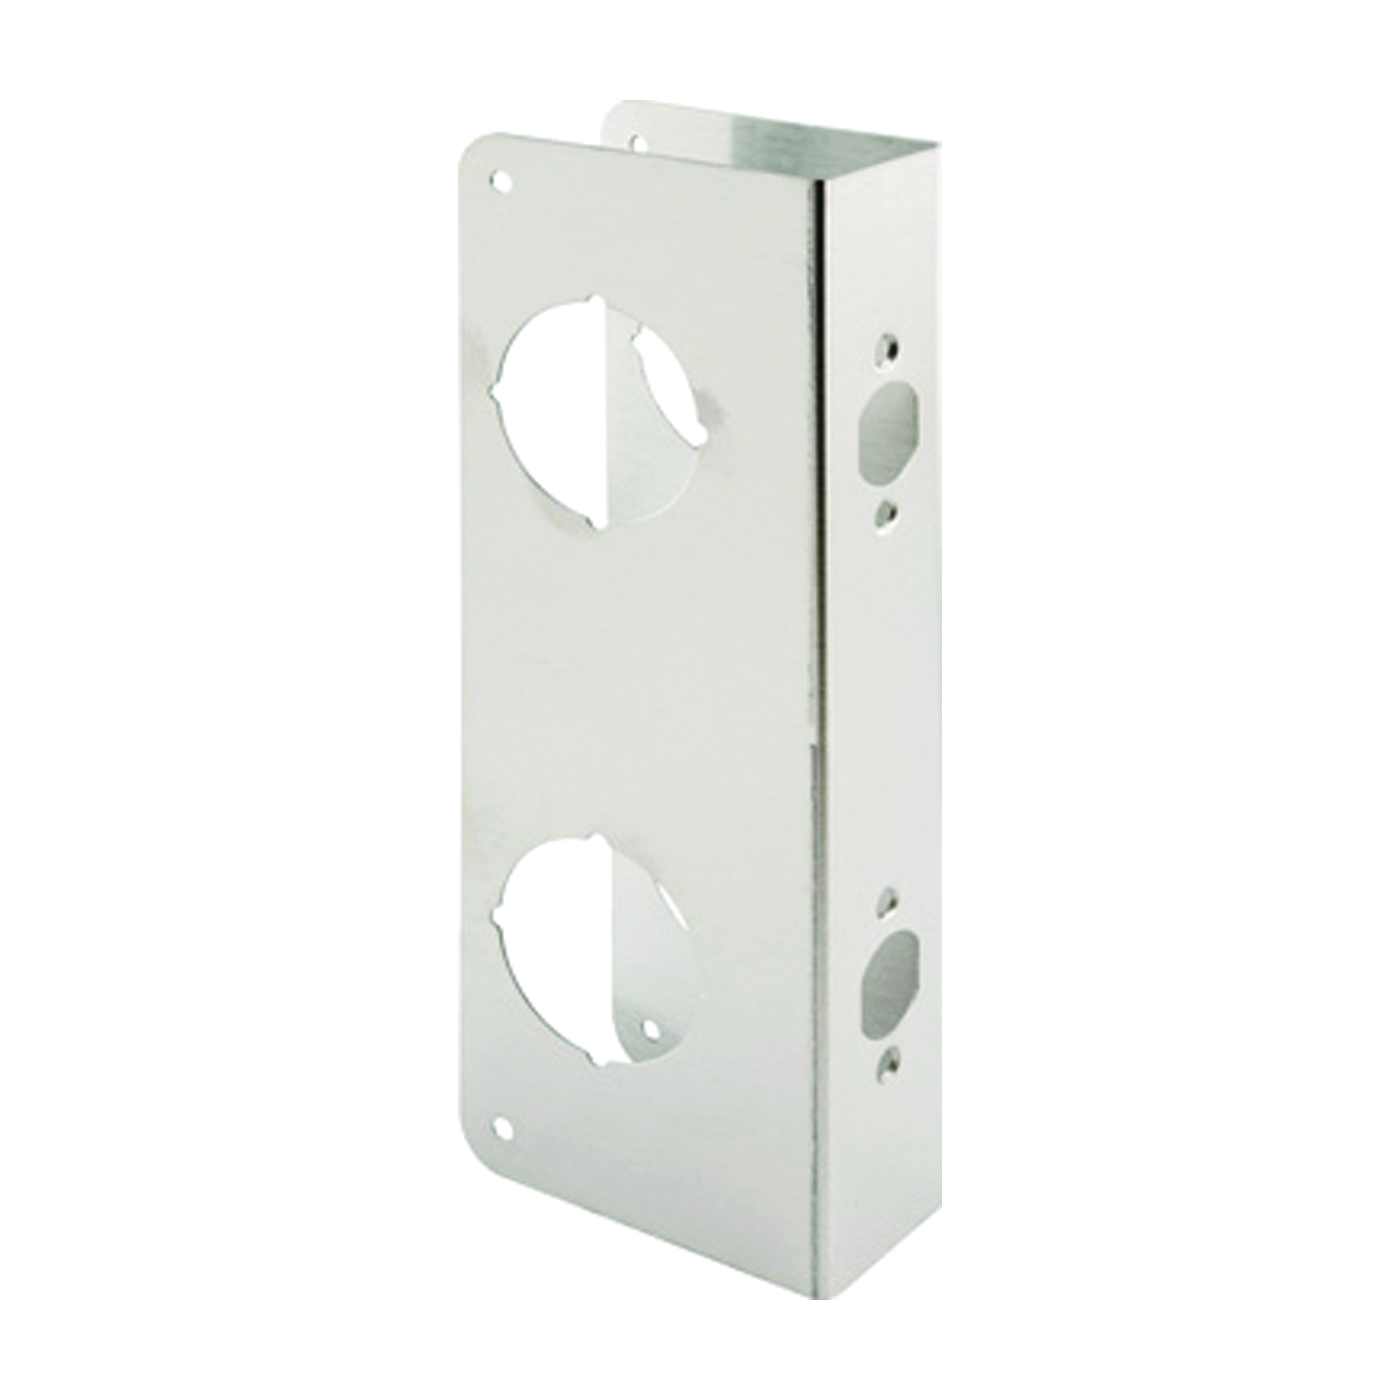 Picture of Prime-Line U 10539 Lock and Door Reinforcer, 2-3/8 in Backset, 1-3/4 in Thick Door, Stainless Steel, Stainless Steel